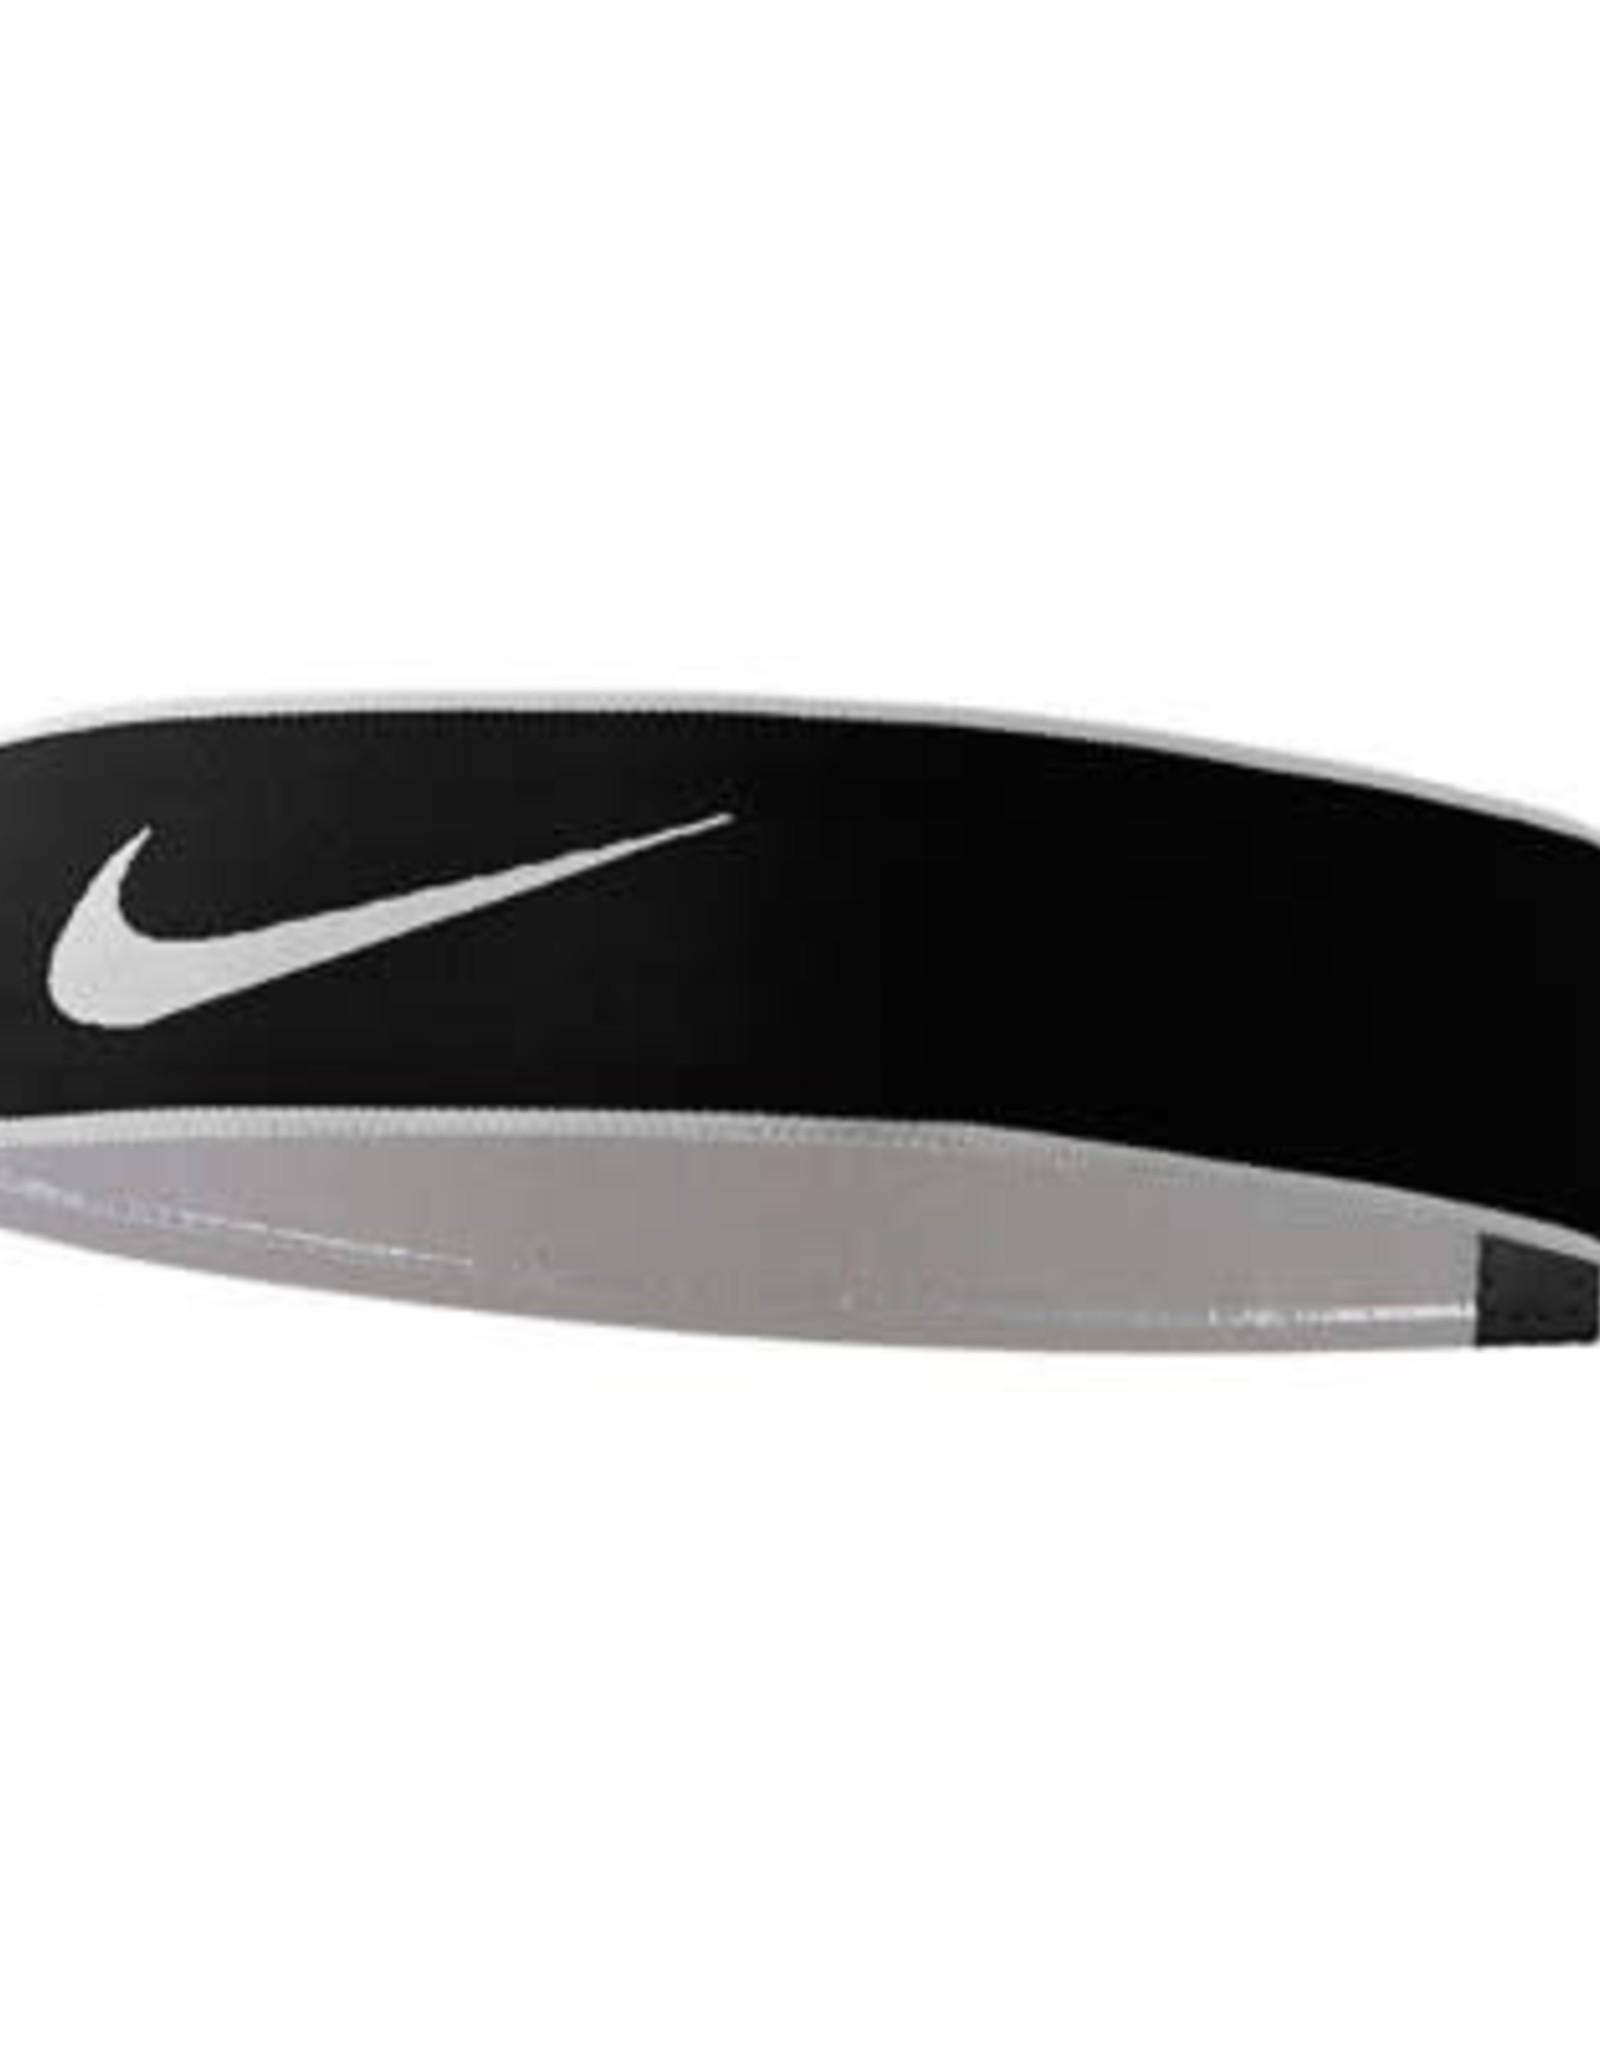 Nike Nik Pro Swoosh Headband